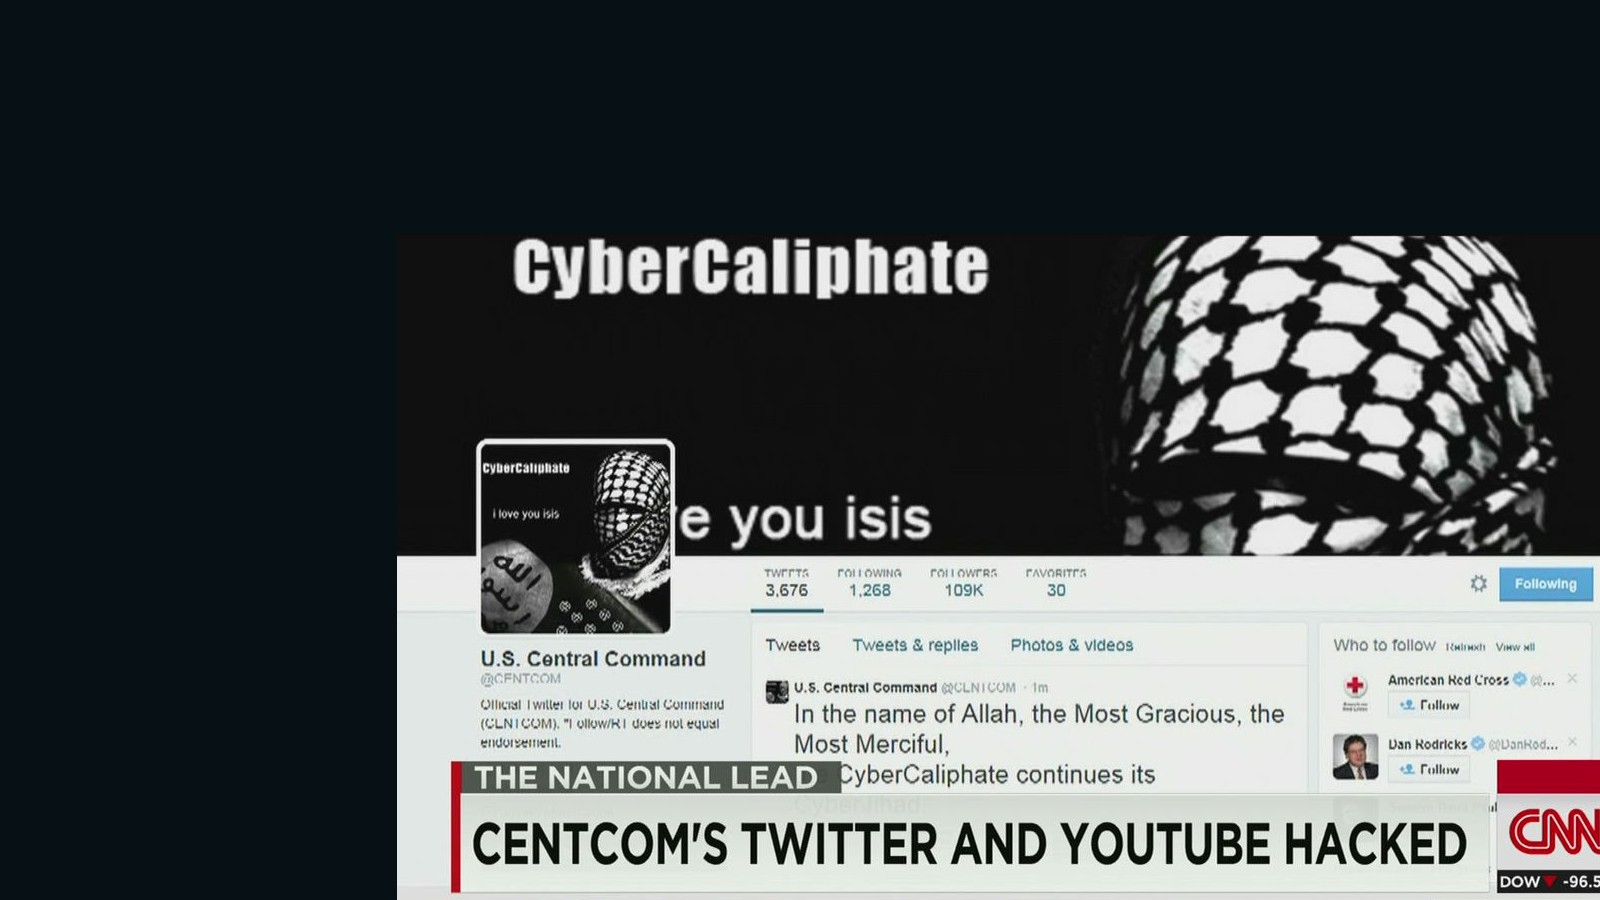 CENTCOM Twitter account hacked, suspended - CNNPolitics